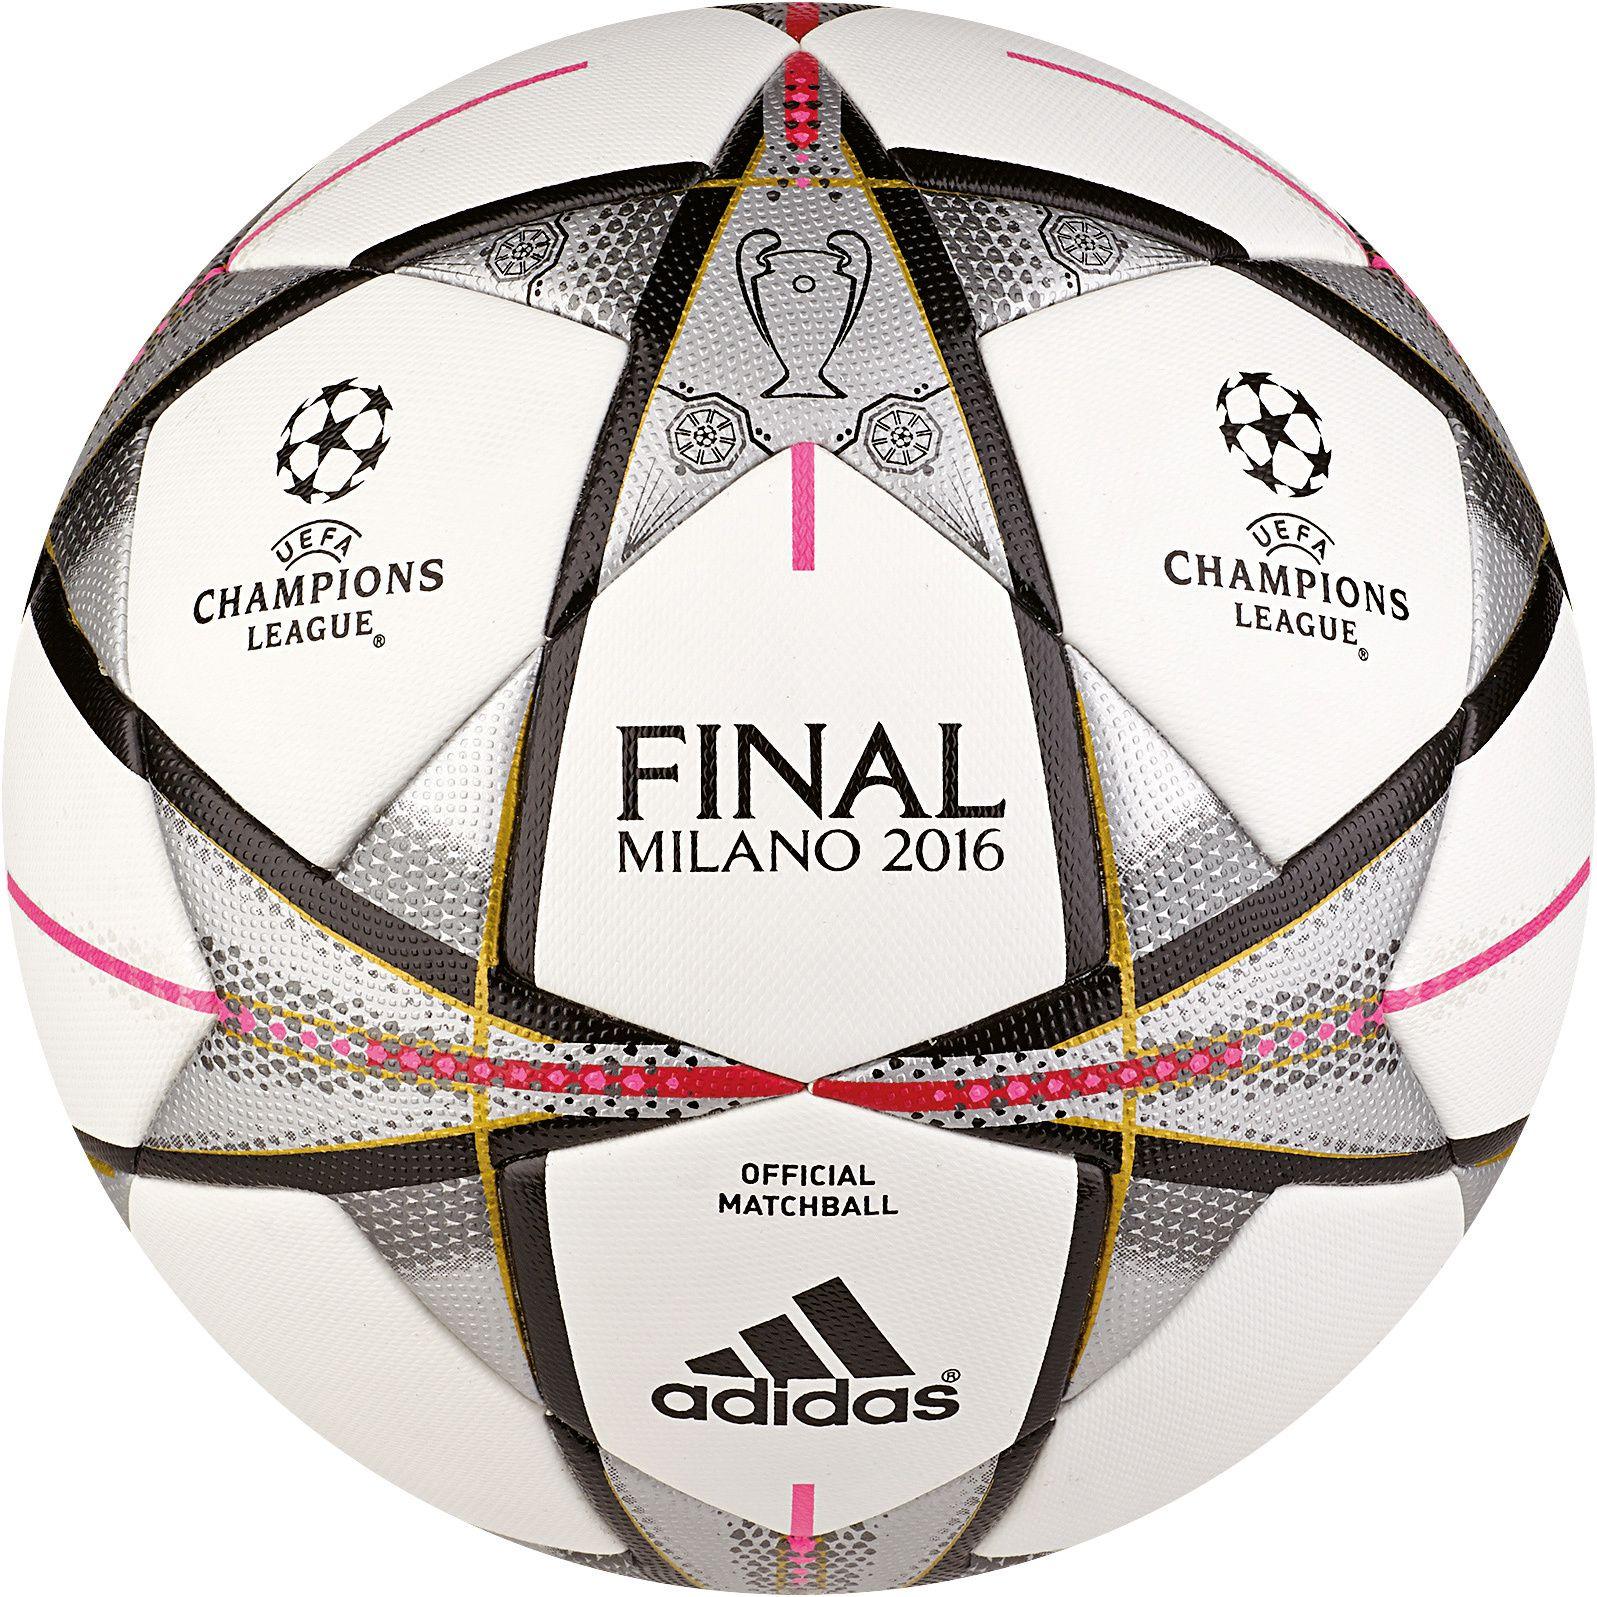 ADIDAS PERFORMANCE adidas Performance Champions League Finale Mailand Matchball